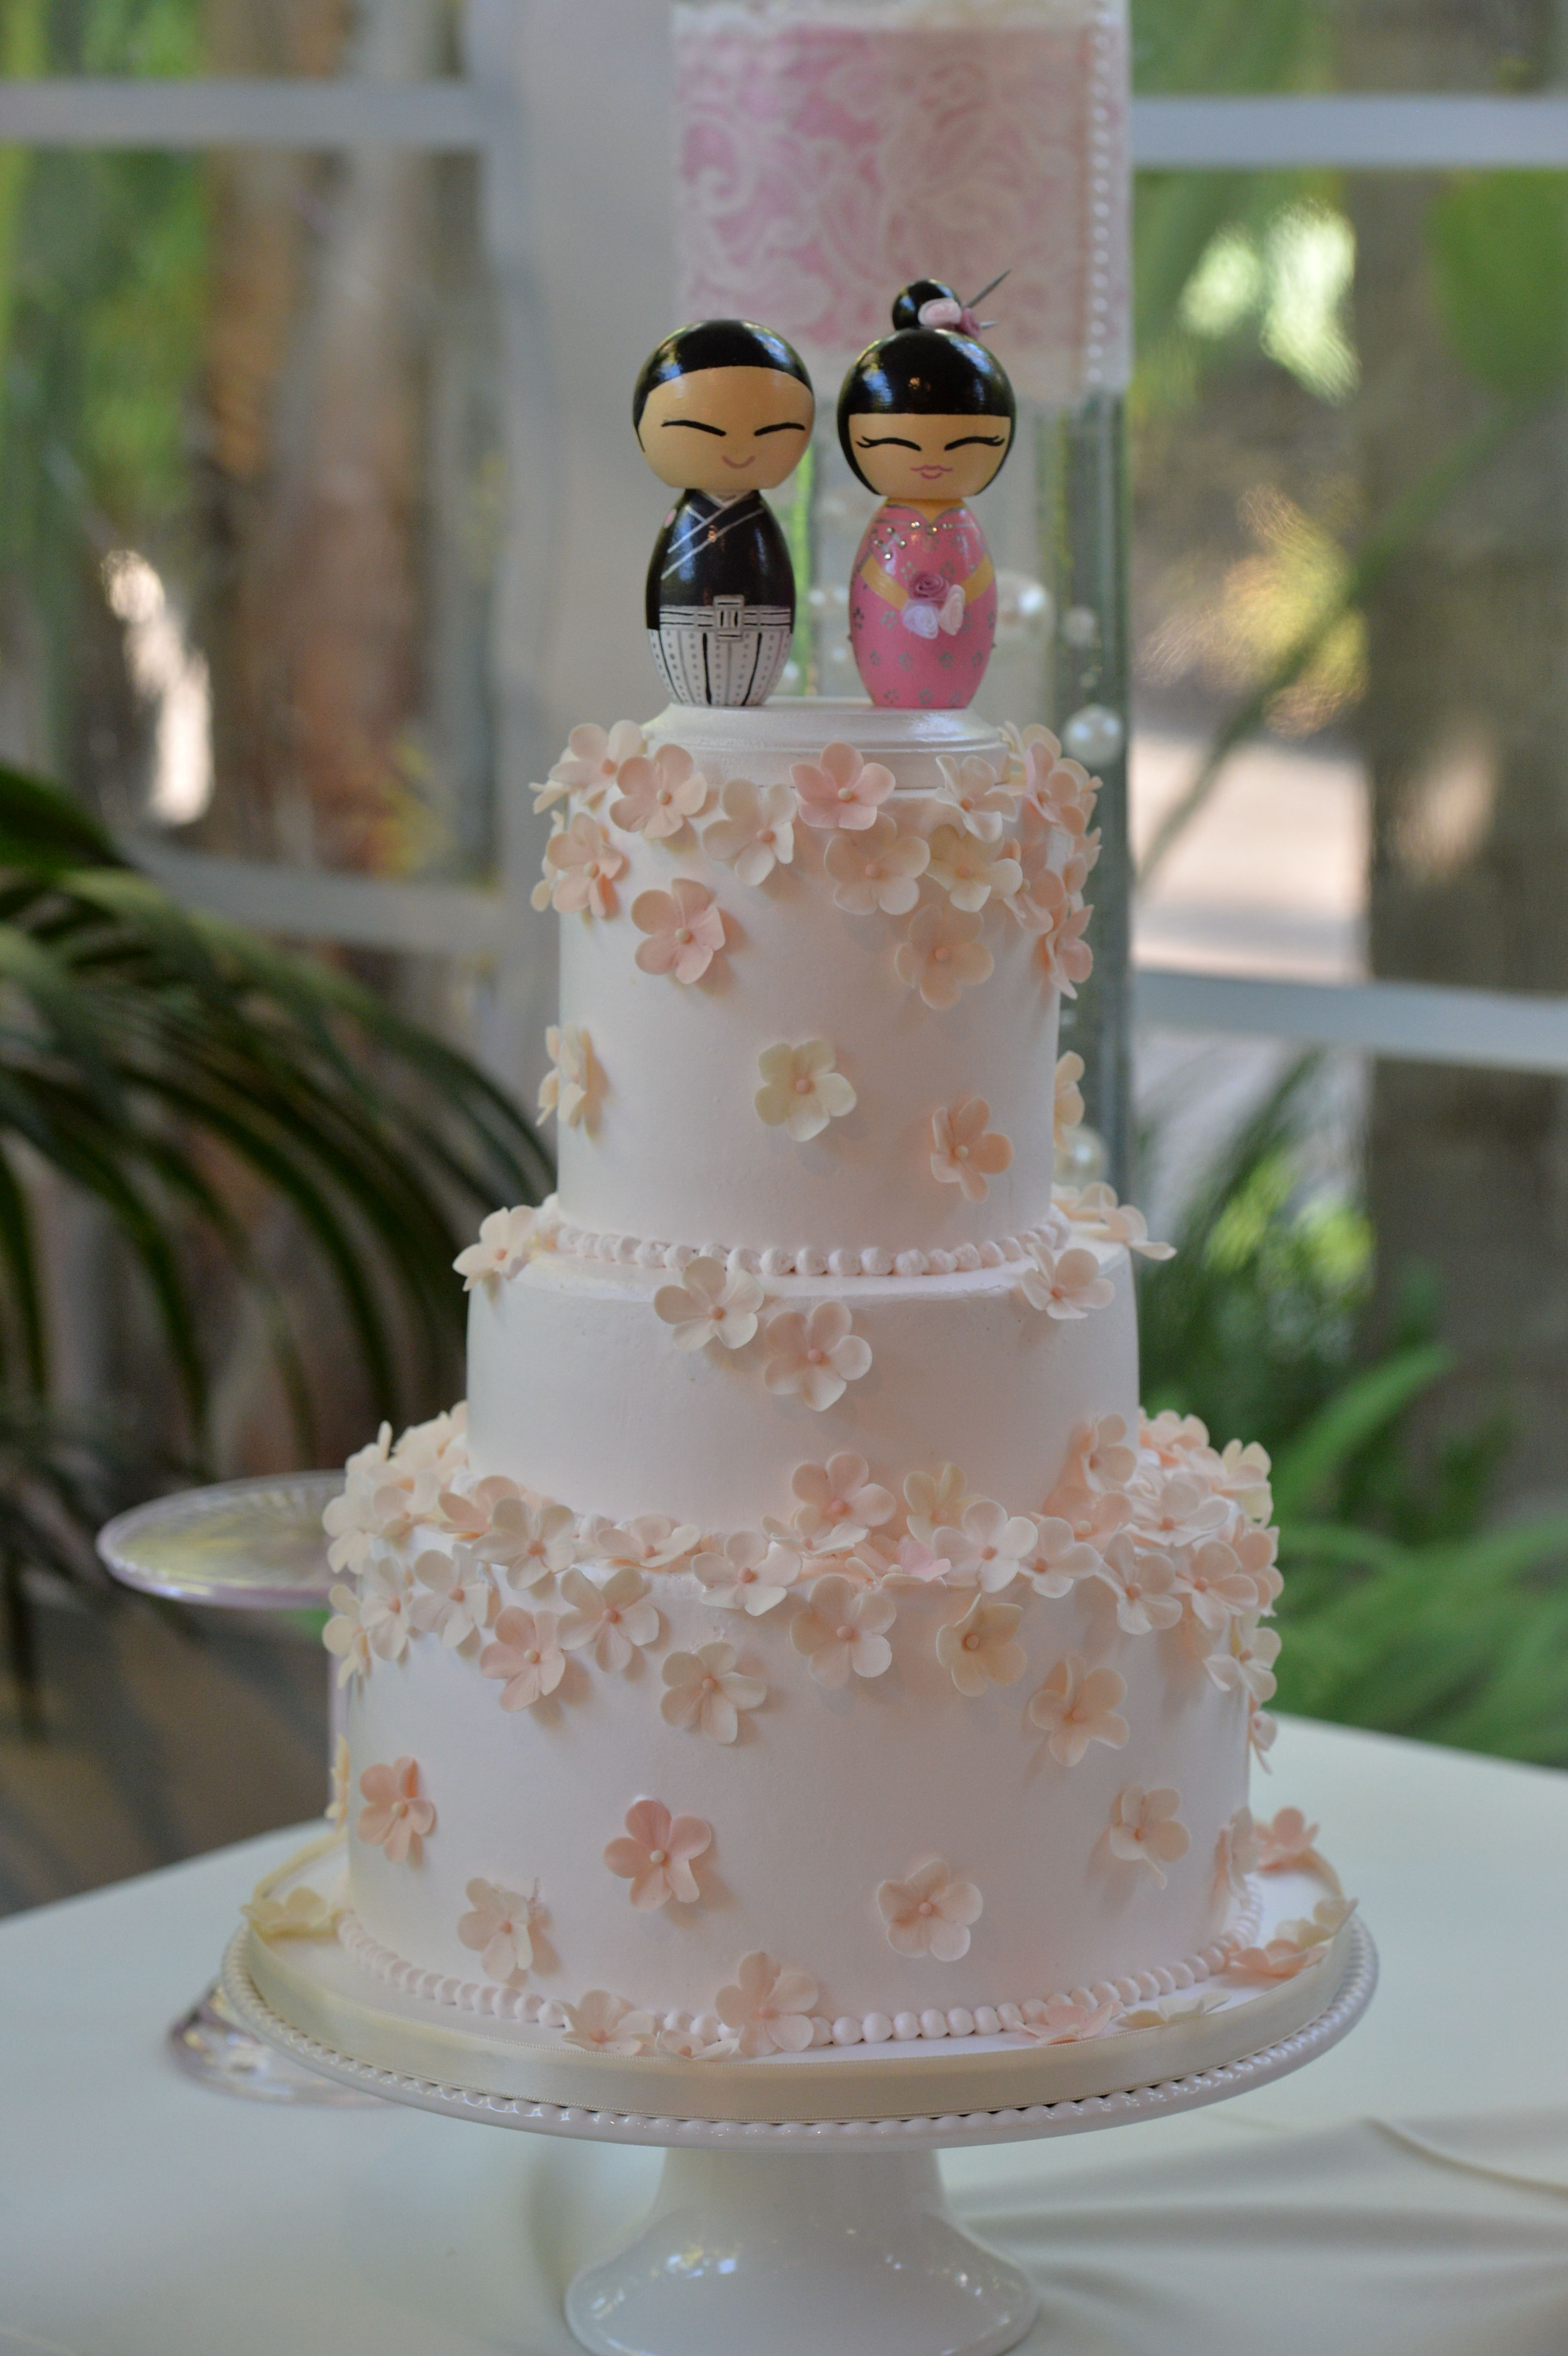 Our Wedding Cake Lemon Cake With Fresh Blueberry And Lemon Curd